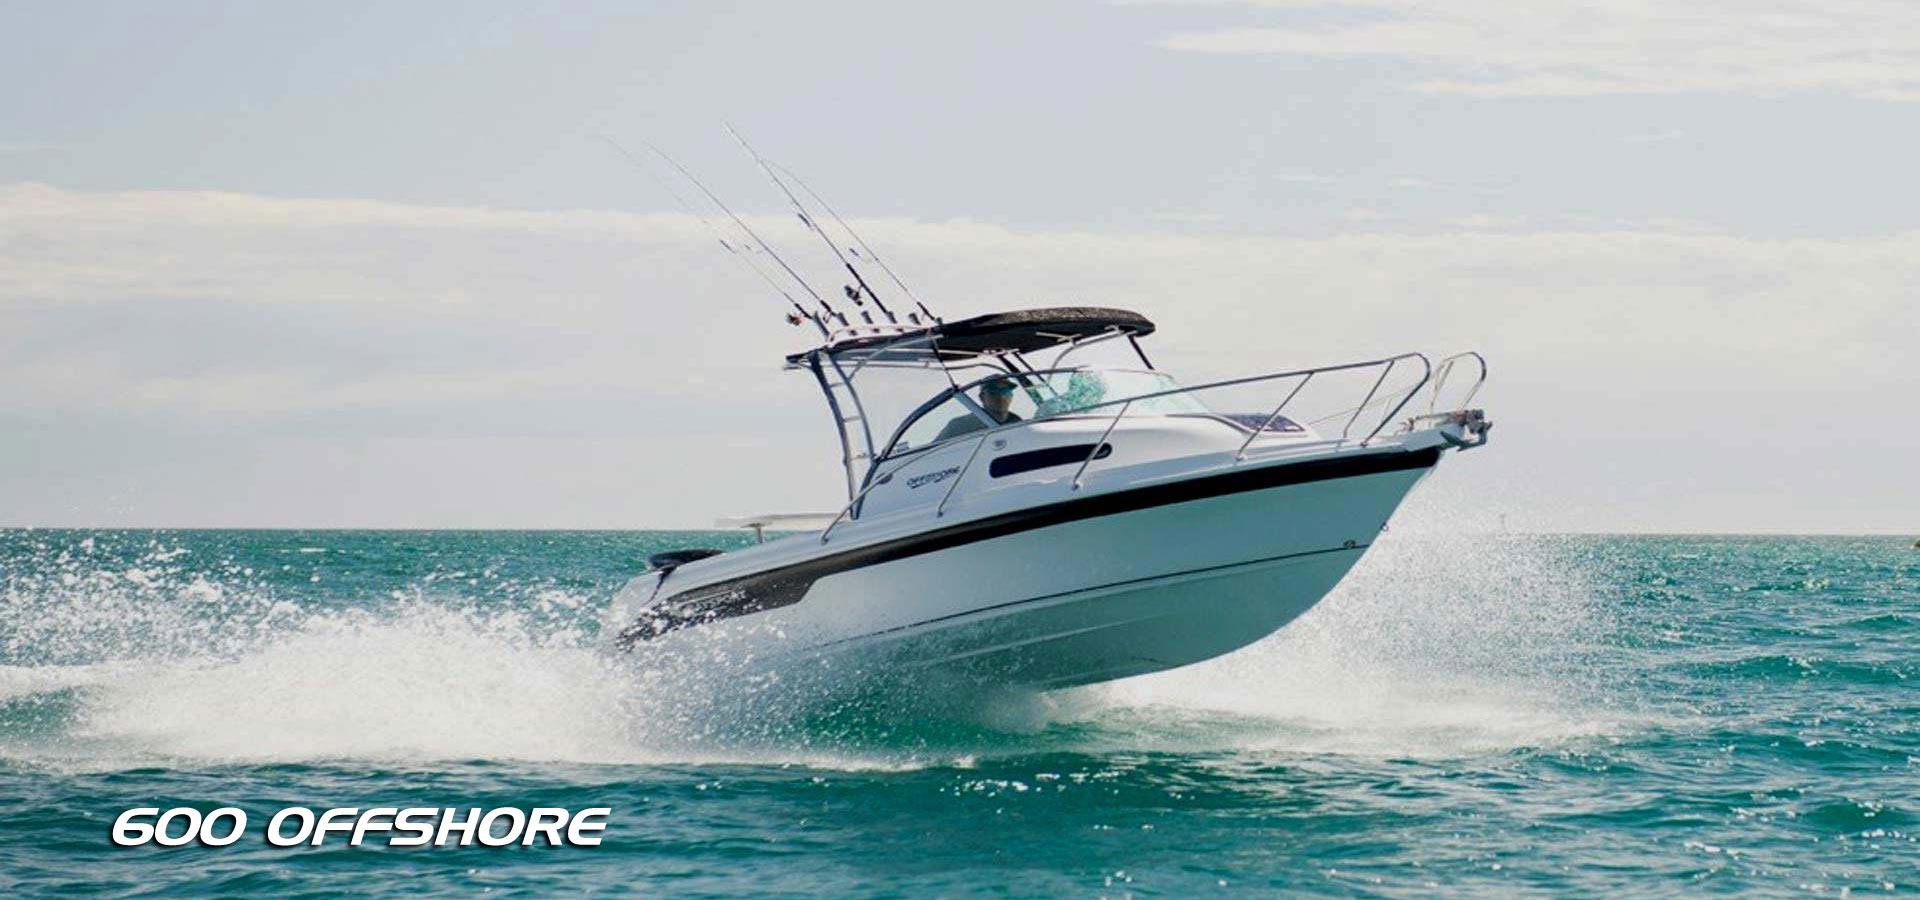 Baysport Boats 600 Offshore fibreglass boat